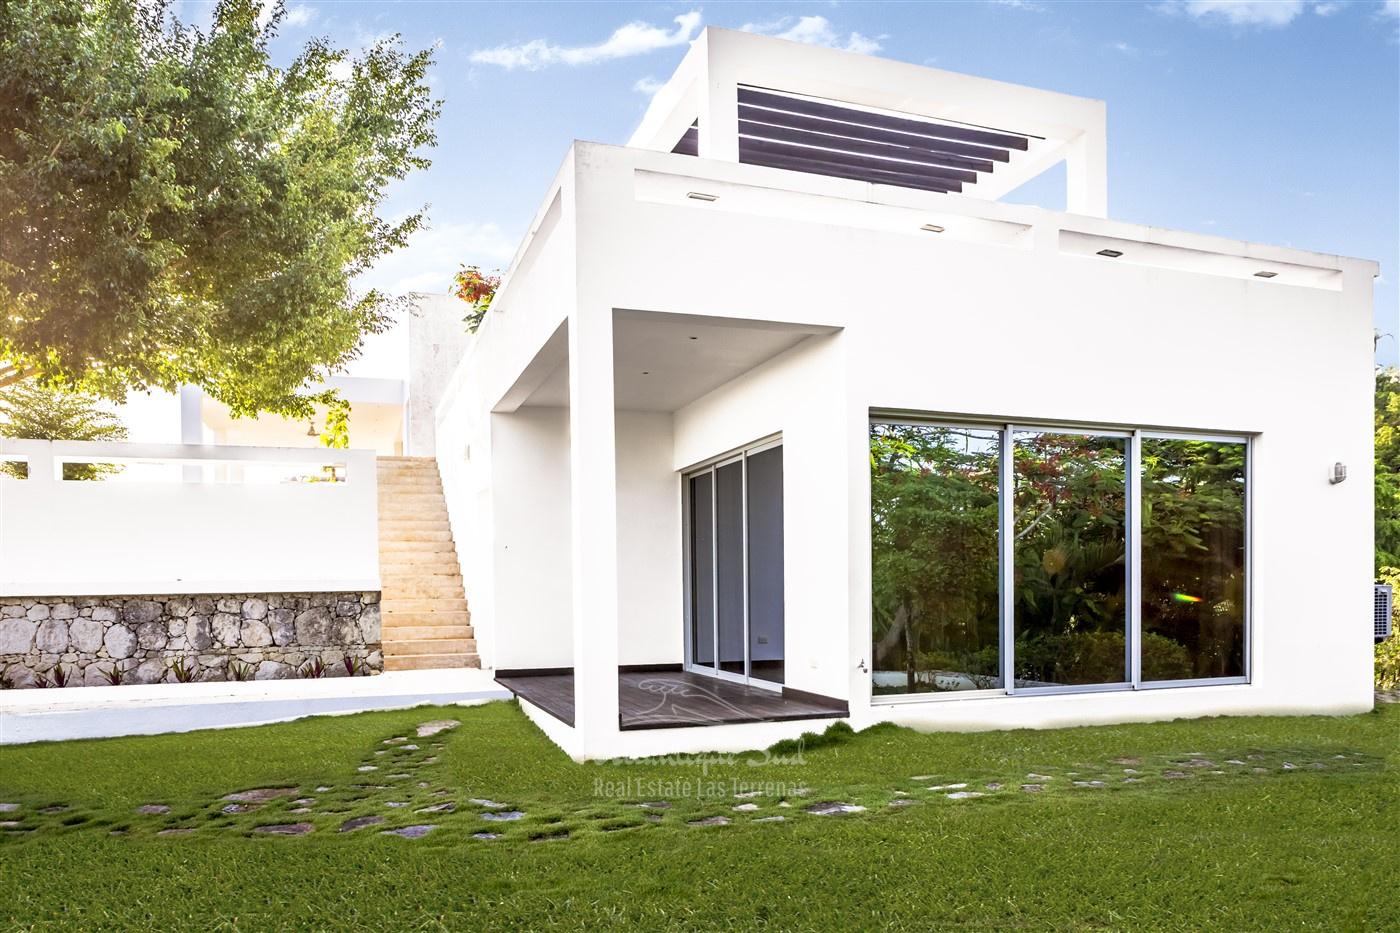 Modern Villa on a hill with ocean views Real Estate Las Terrenas Dominican Republic11.jpg